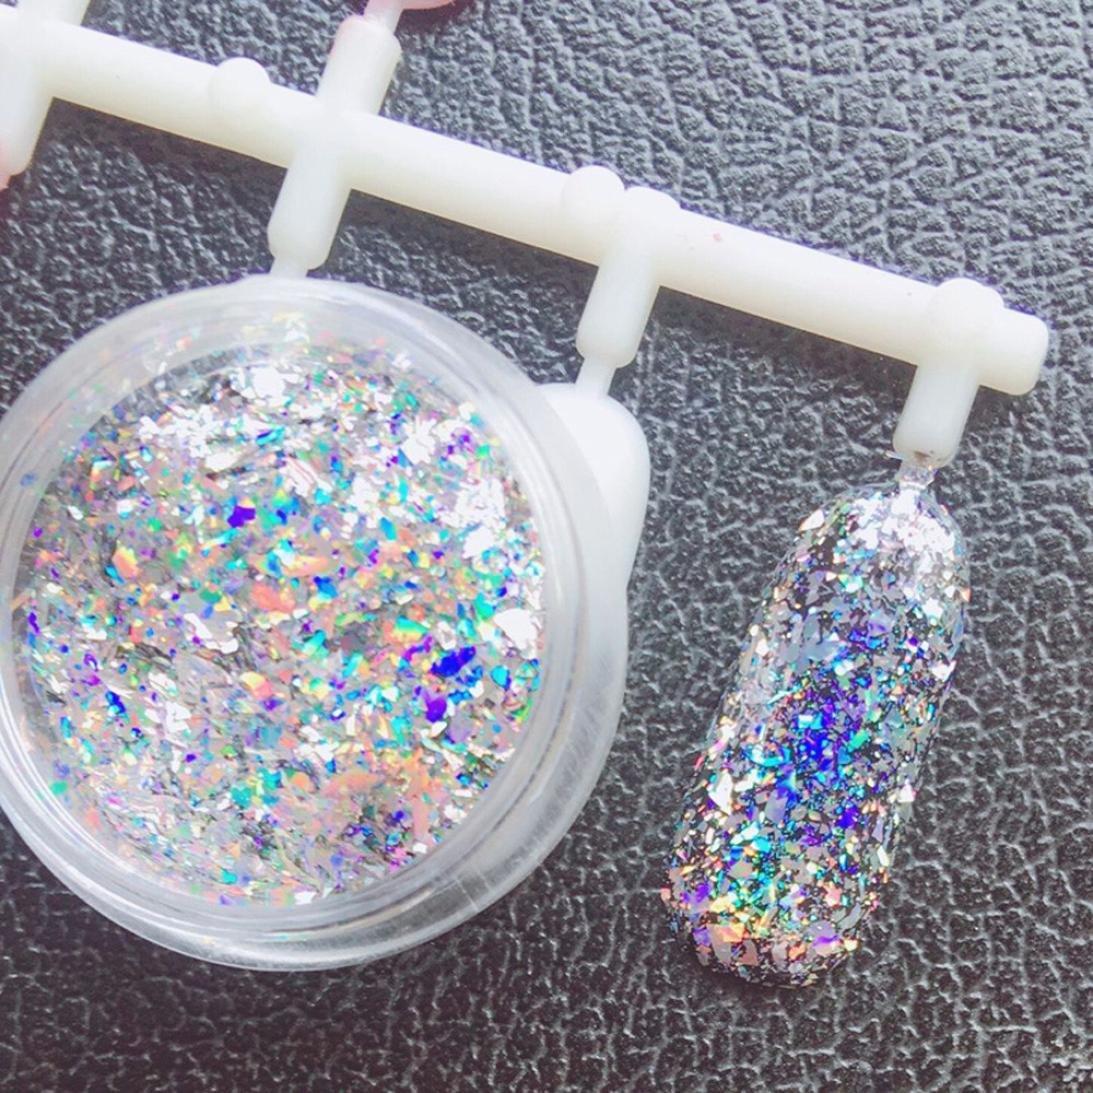 Dolloress Beauty Nail Belleza Uña⭐ DIY Nail Decal Mirror Glitter Aluminum Flakes Magic Mirror Effect Powders Sequins